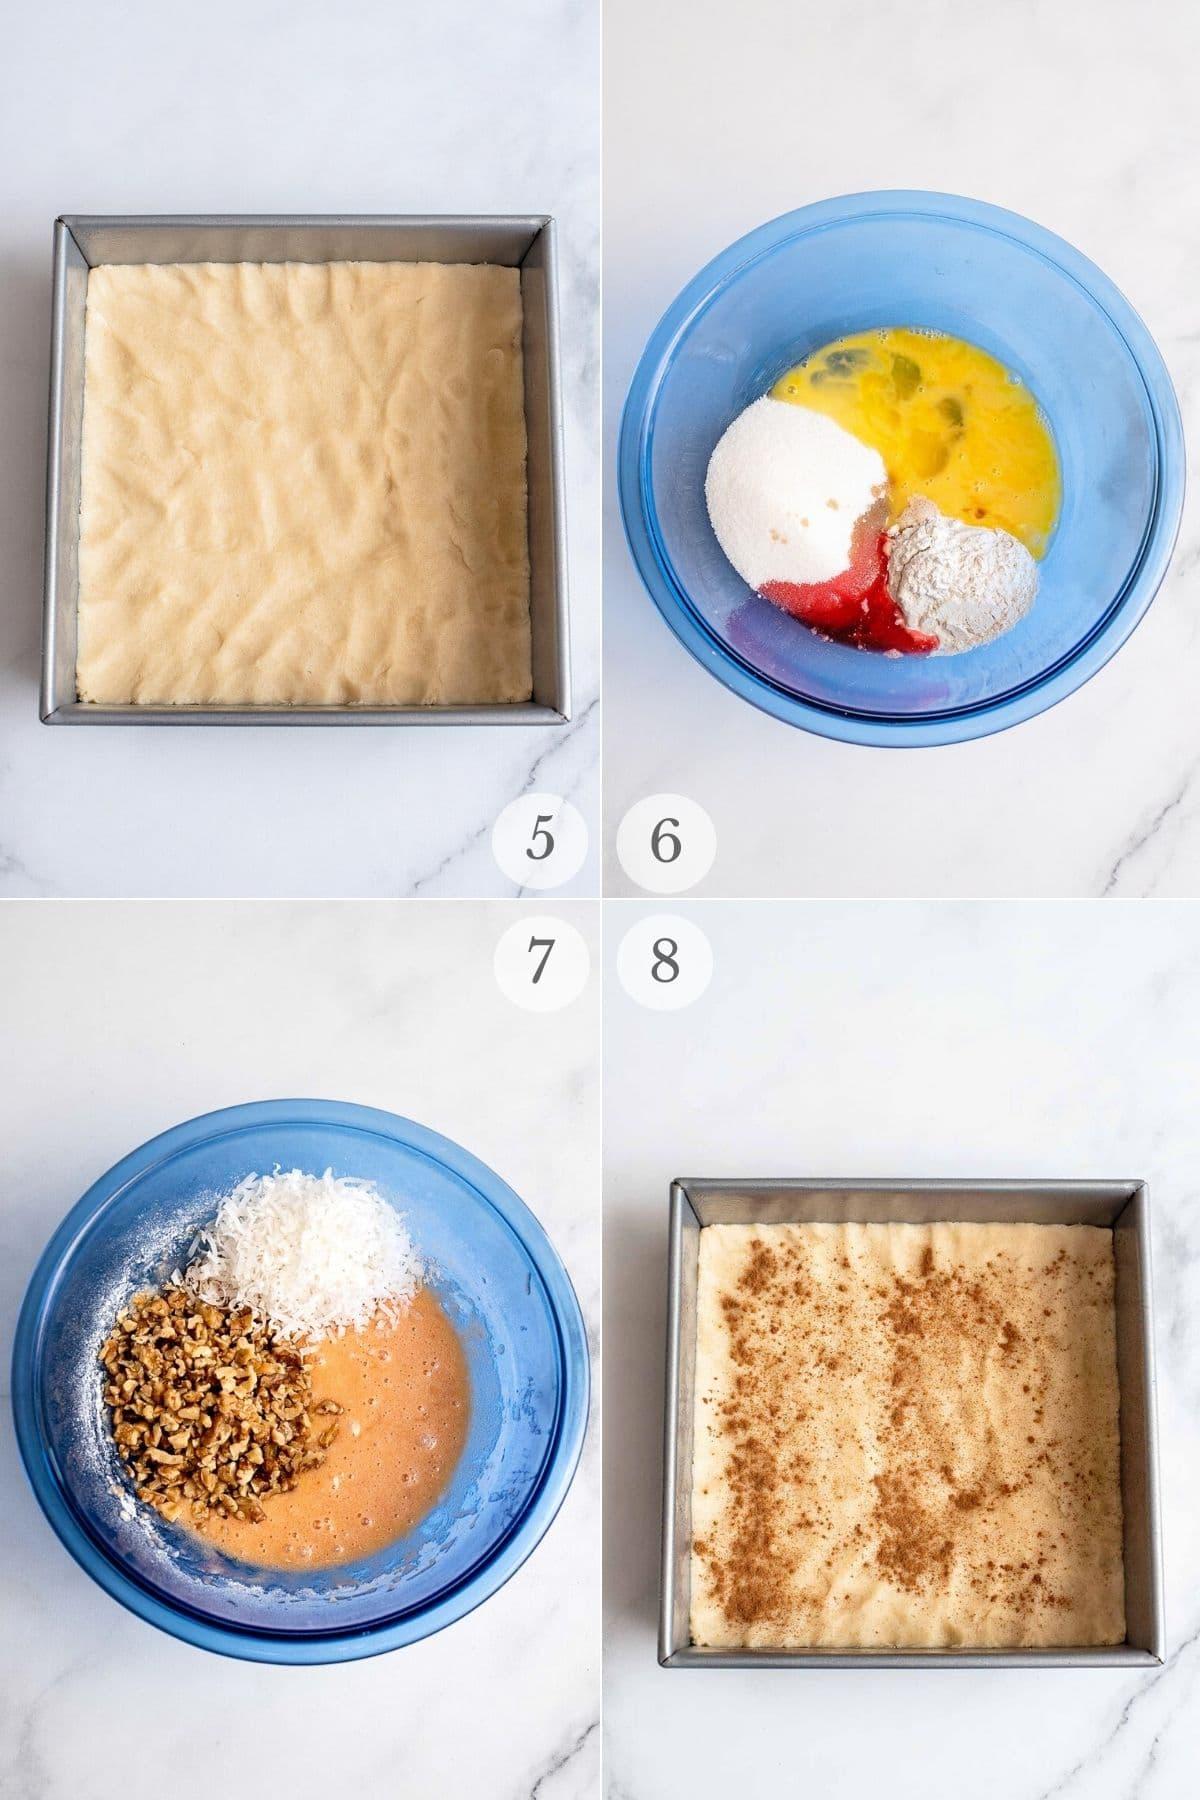 cherry bars recipe steps 5-8